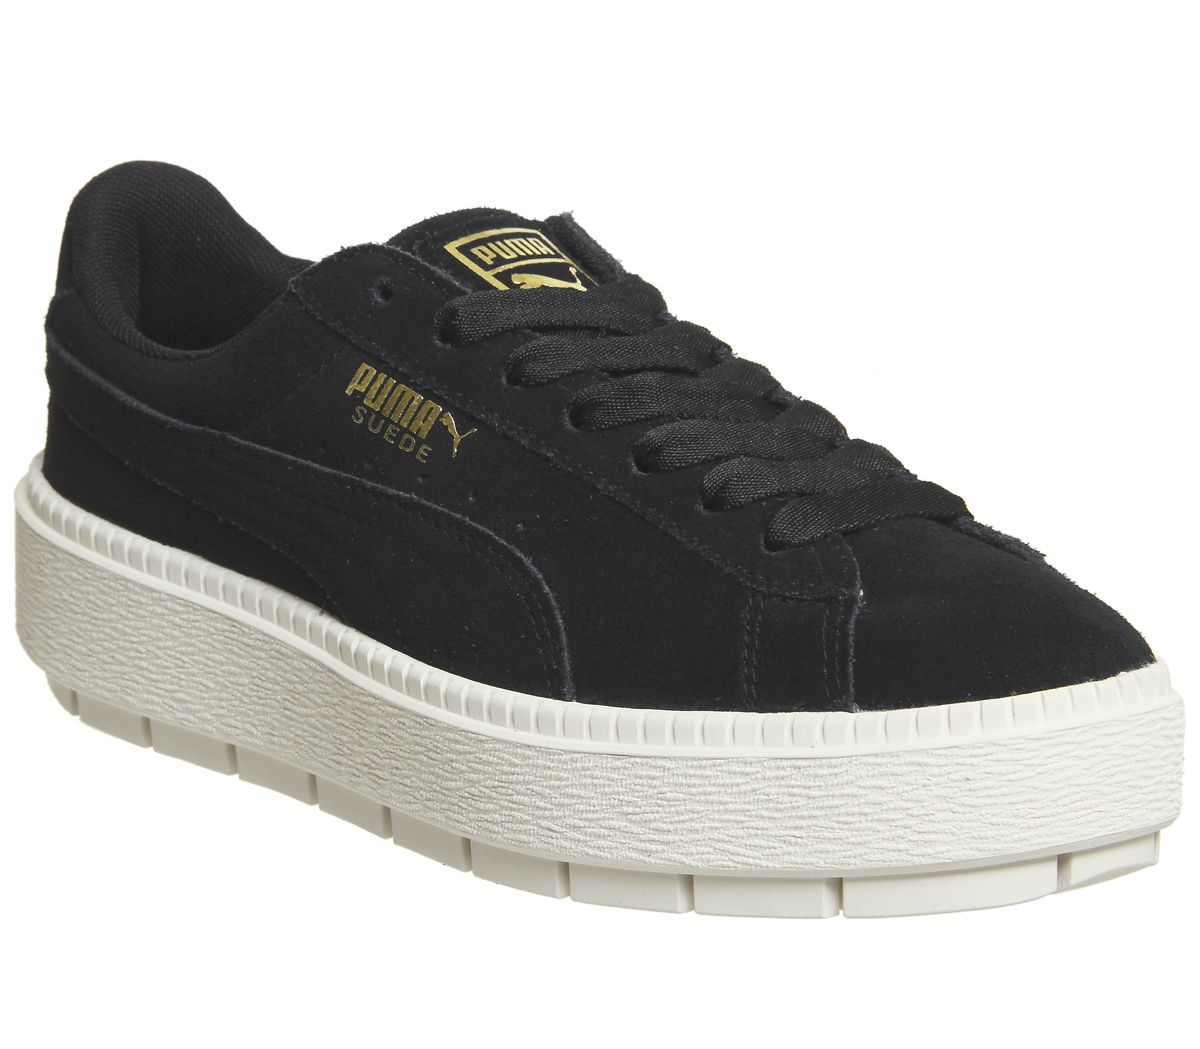 9eae328f232edb Puma Suede Platform Trace Trainers Black White - Sneaker damen